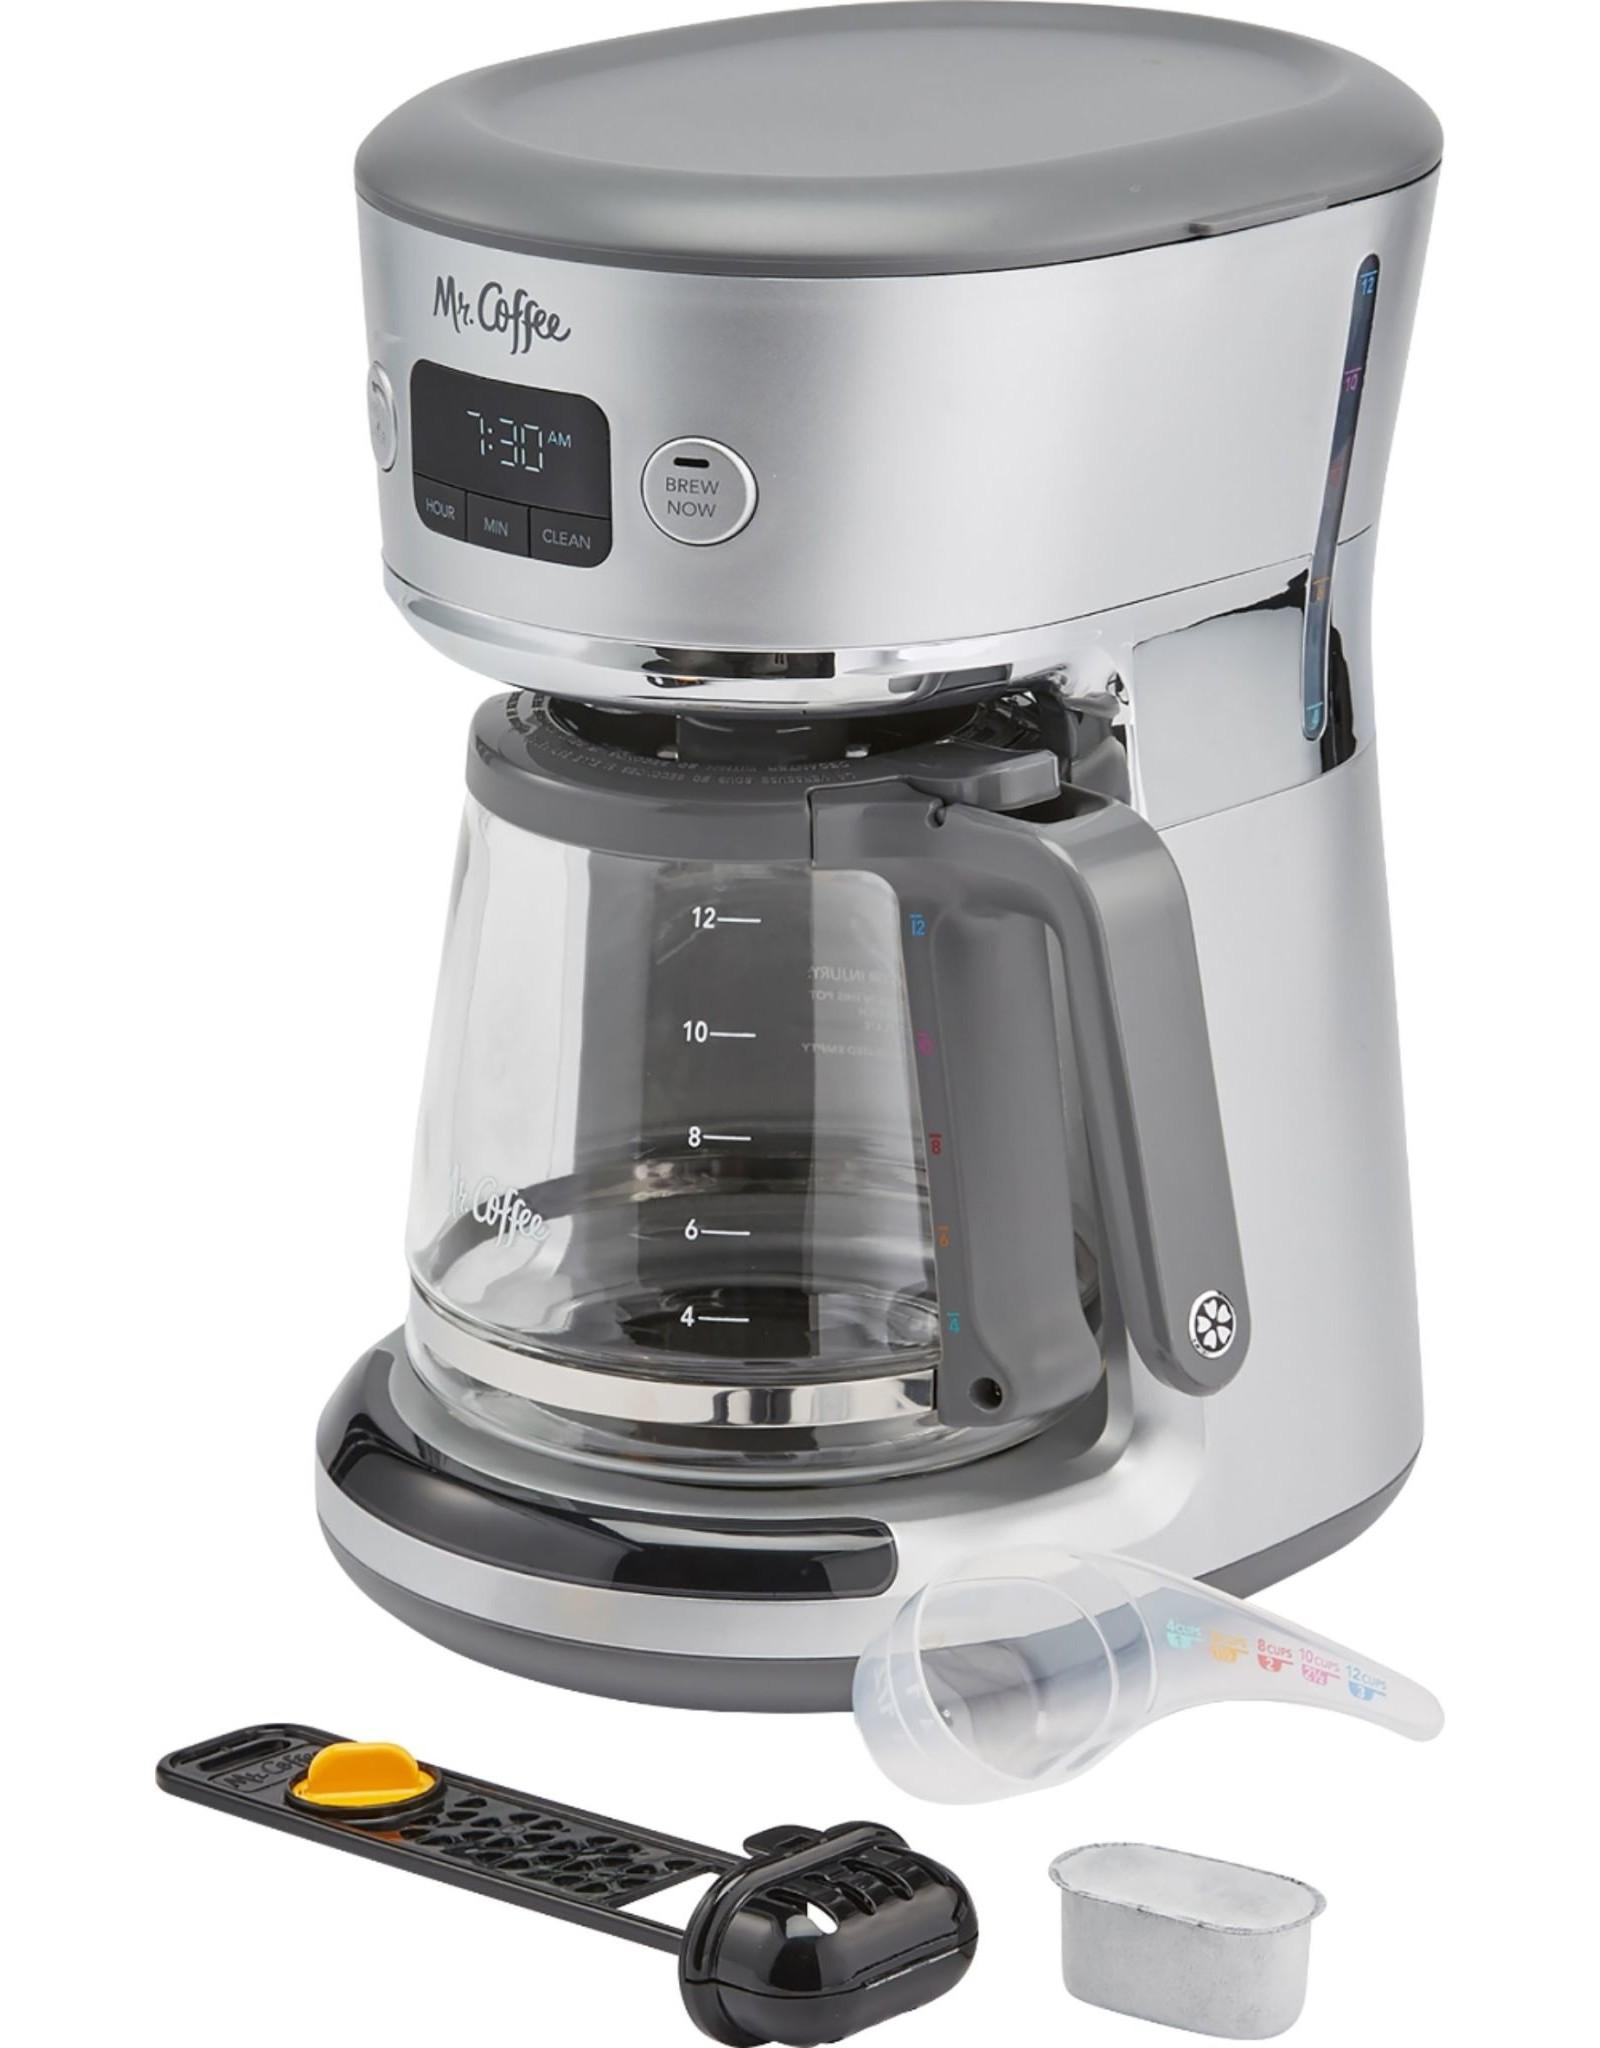 mr. coffee 31160693 Mr. Coffee - Easy Measure 12-Cup Coffee Maker - Silver